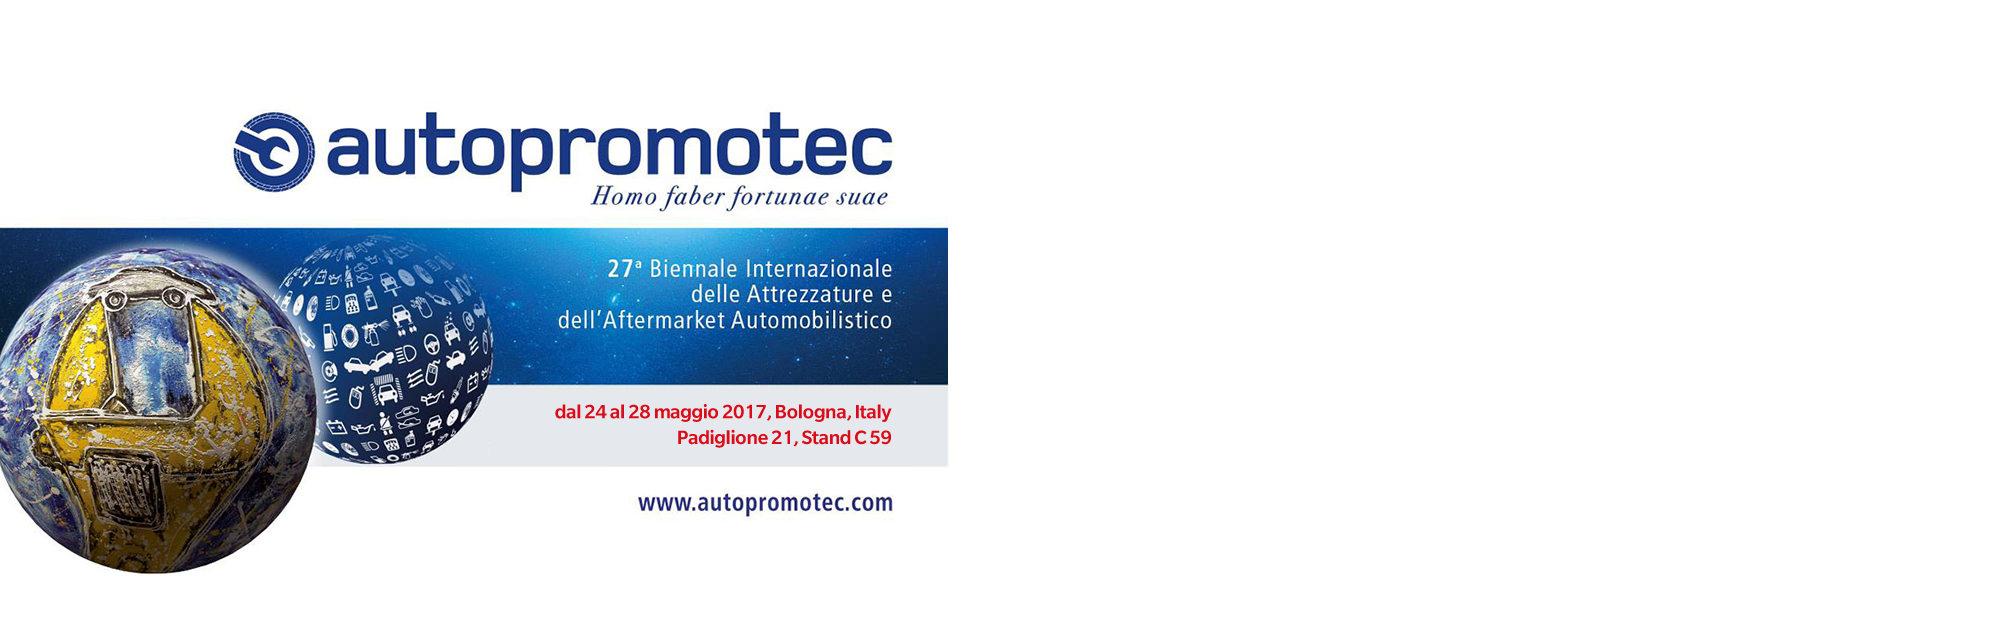 Slide Autopromotec 2017 | SAITO